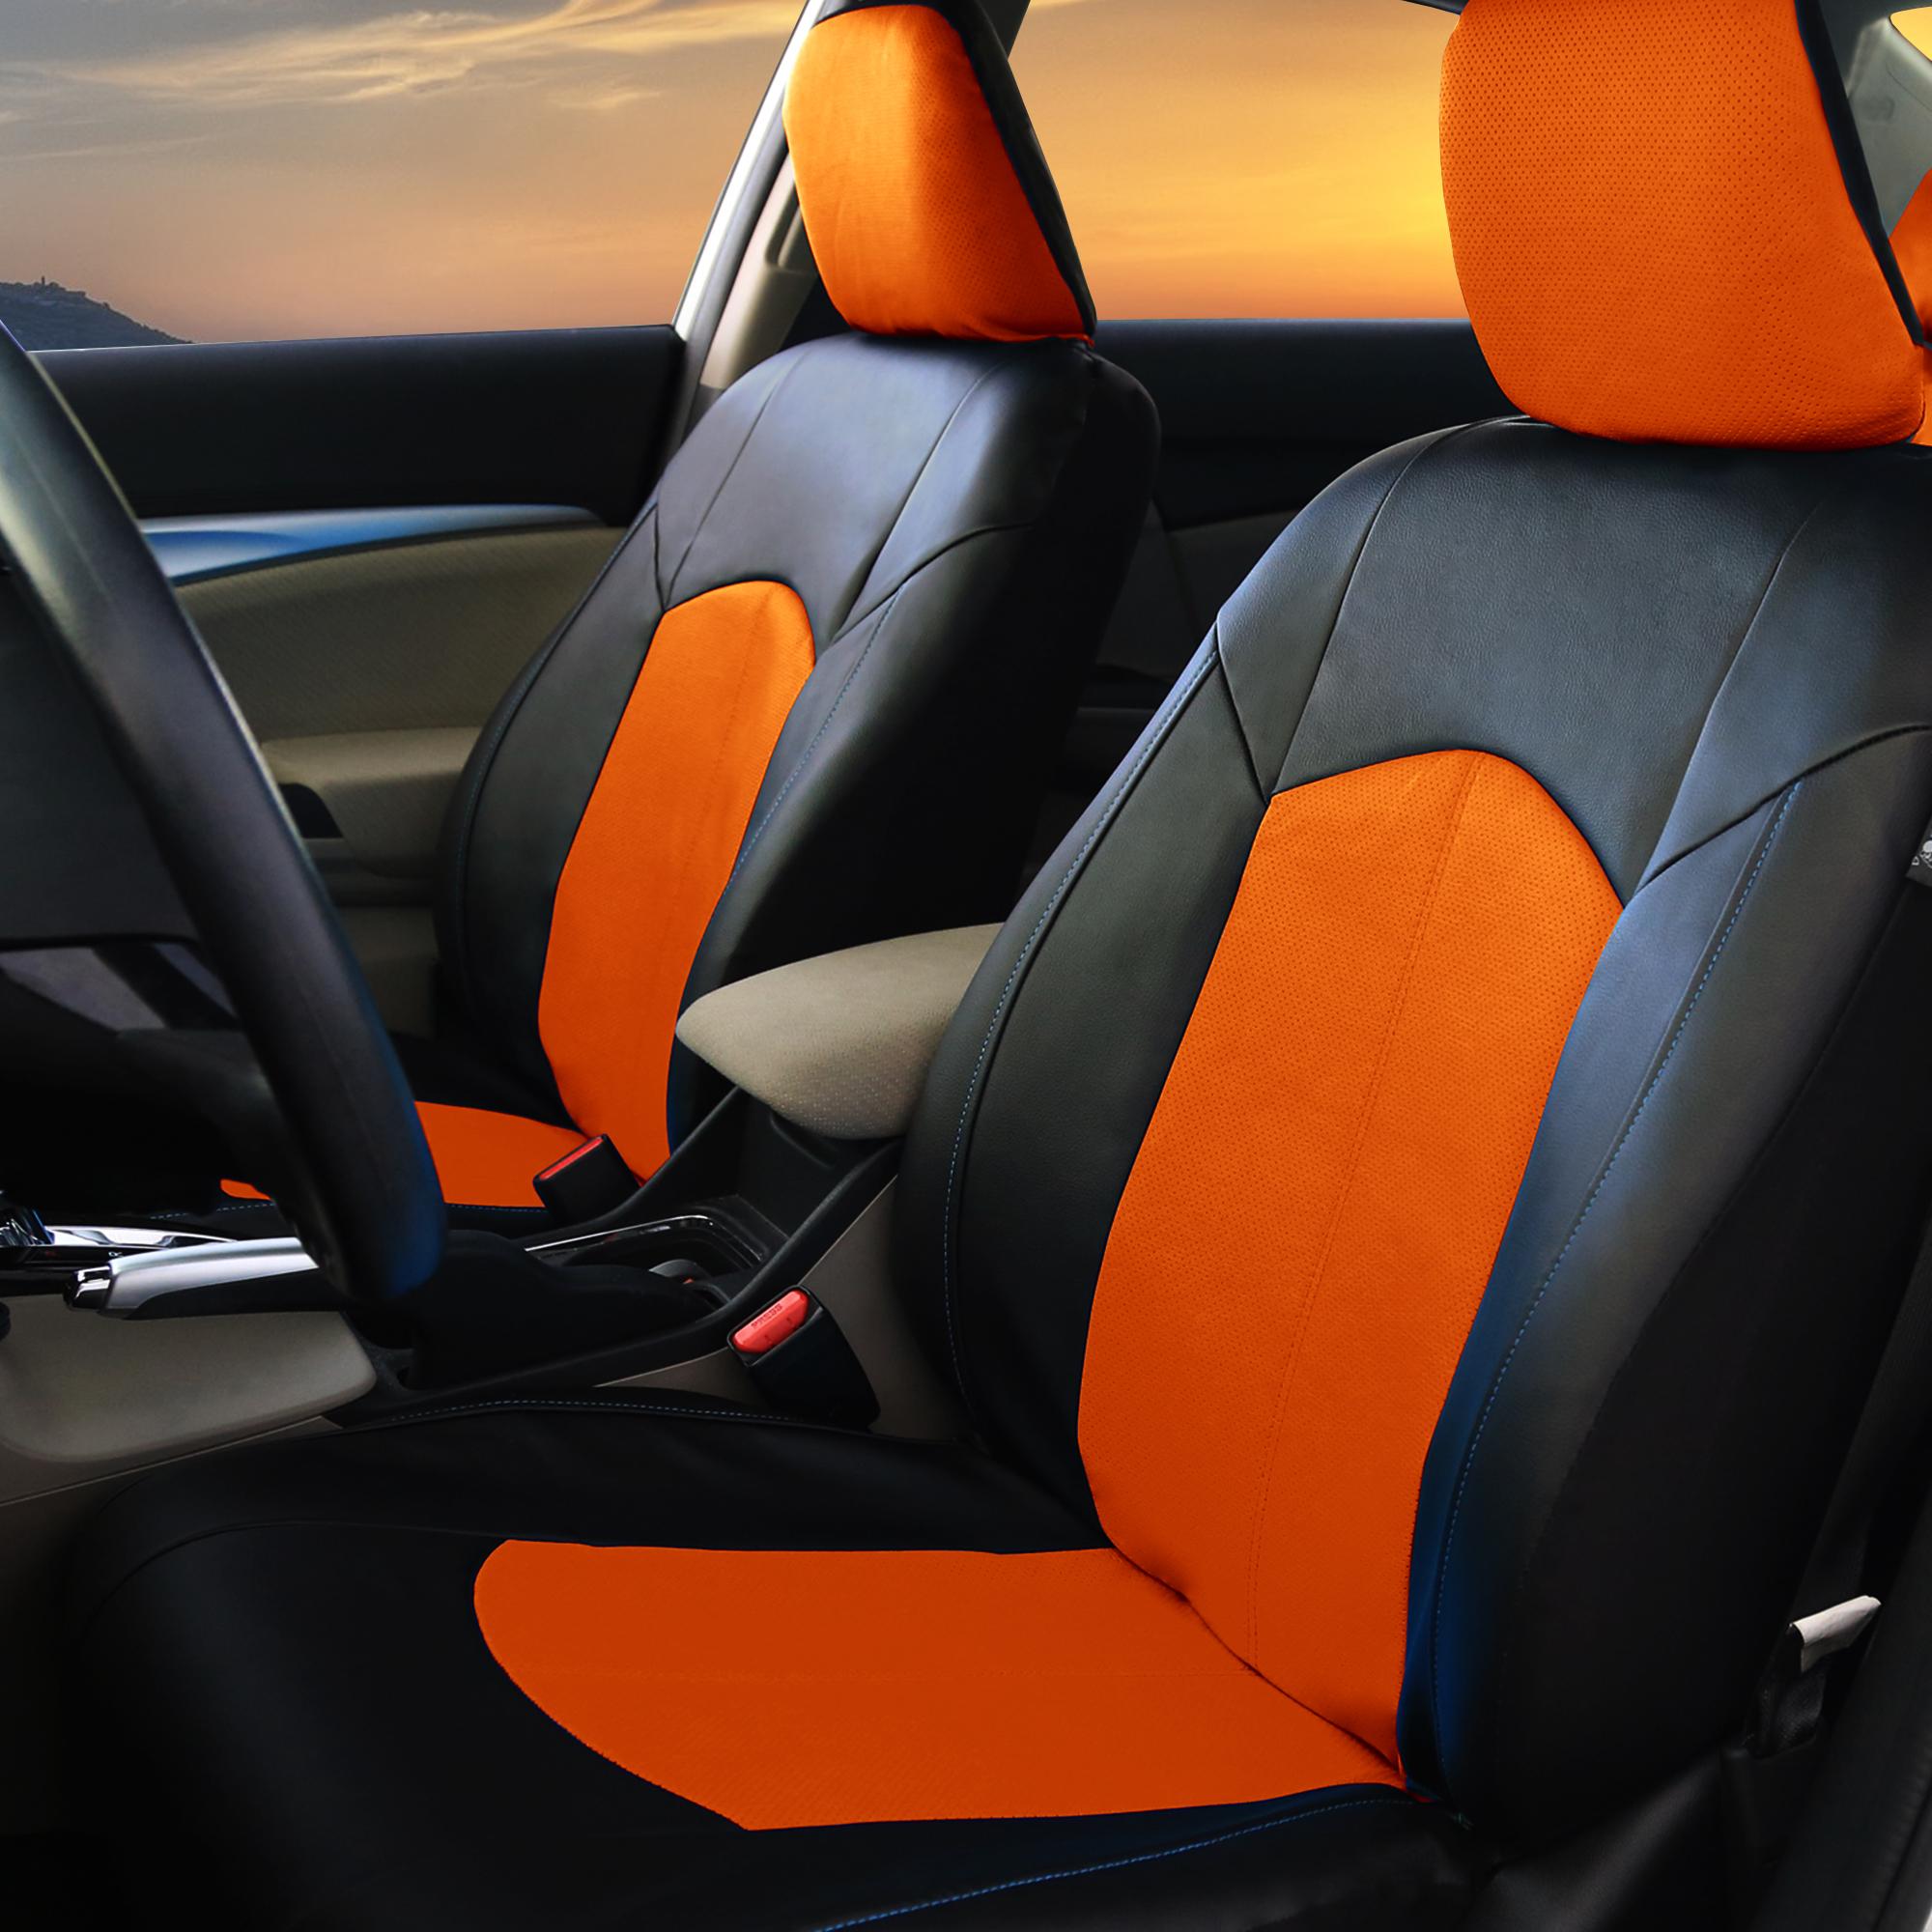 pu leather car seat covers for auto orange black 5 headrests beige floor mat ebay. Black Bedroom Furniture Sets. Home Design Ideas